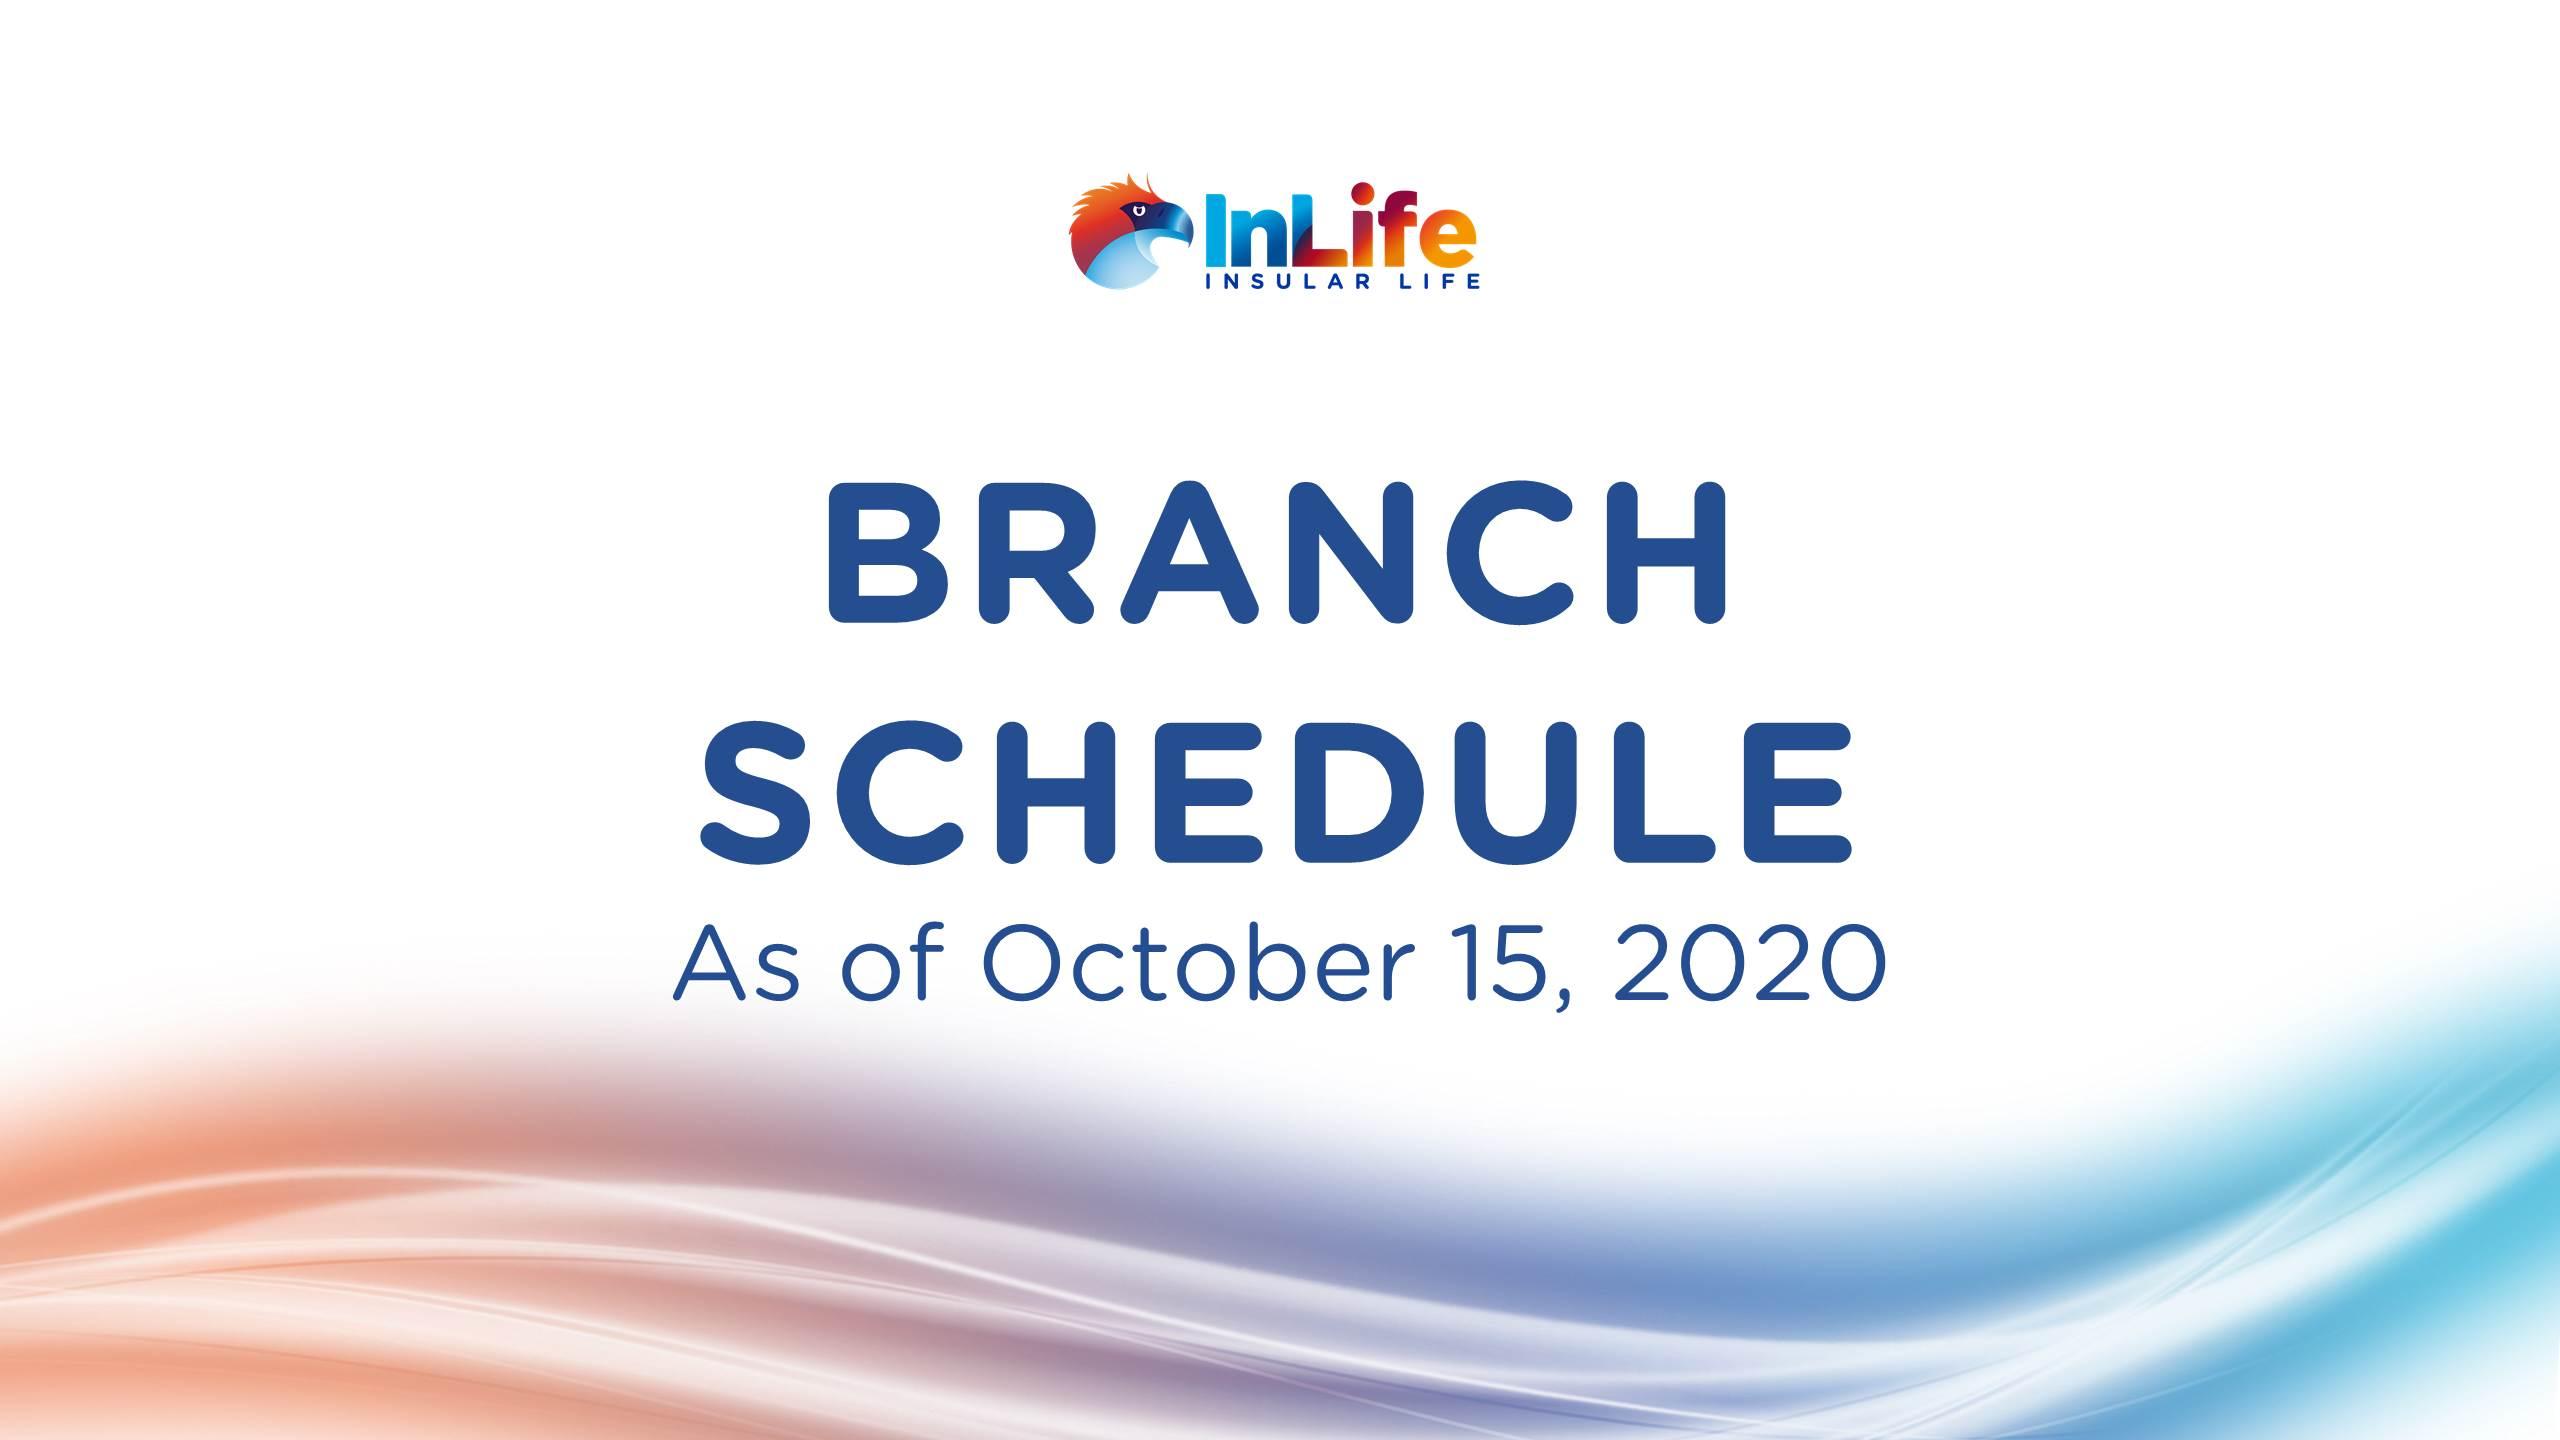 InLife Branch Schedule Starting October 5, 2020